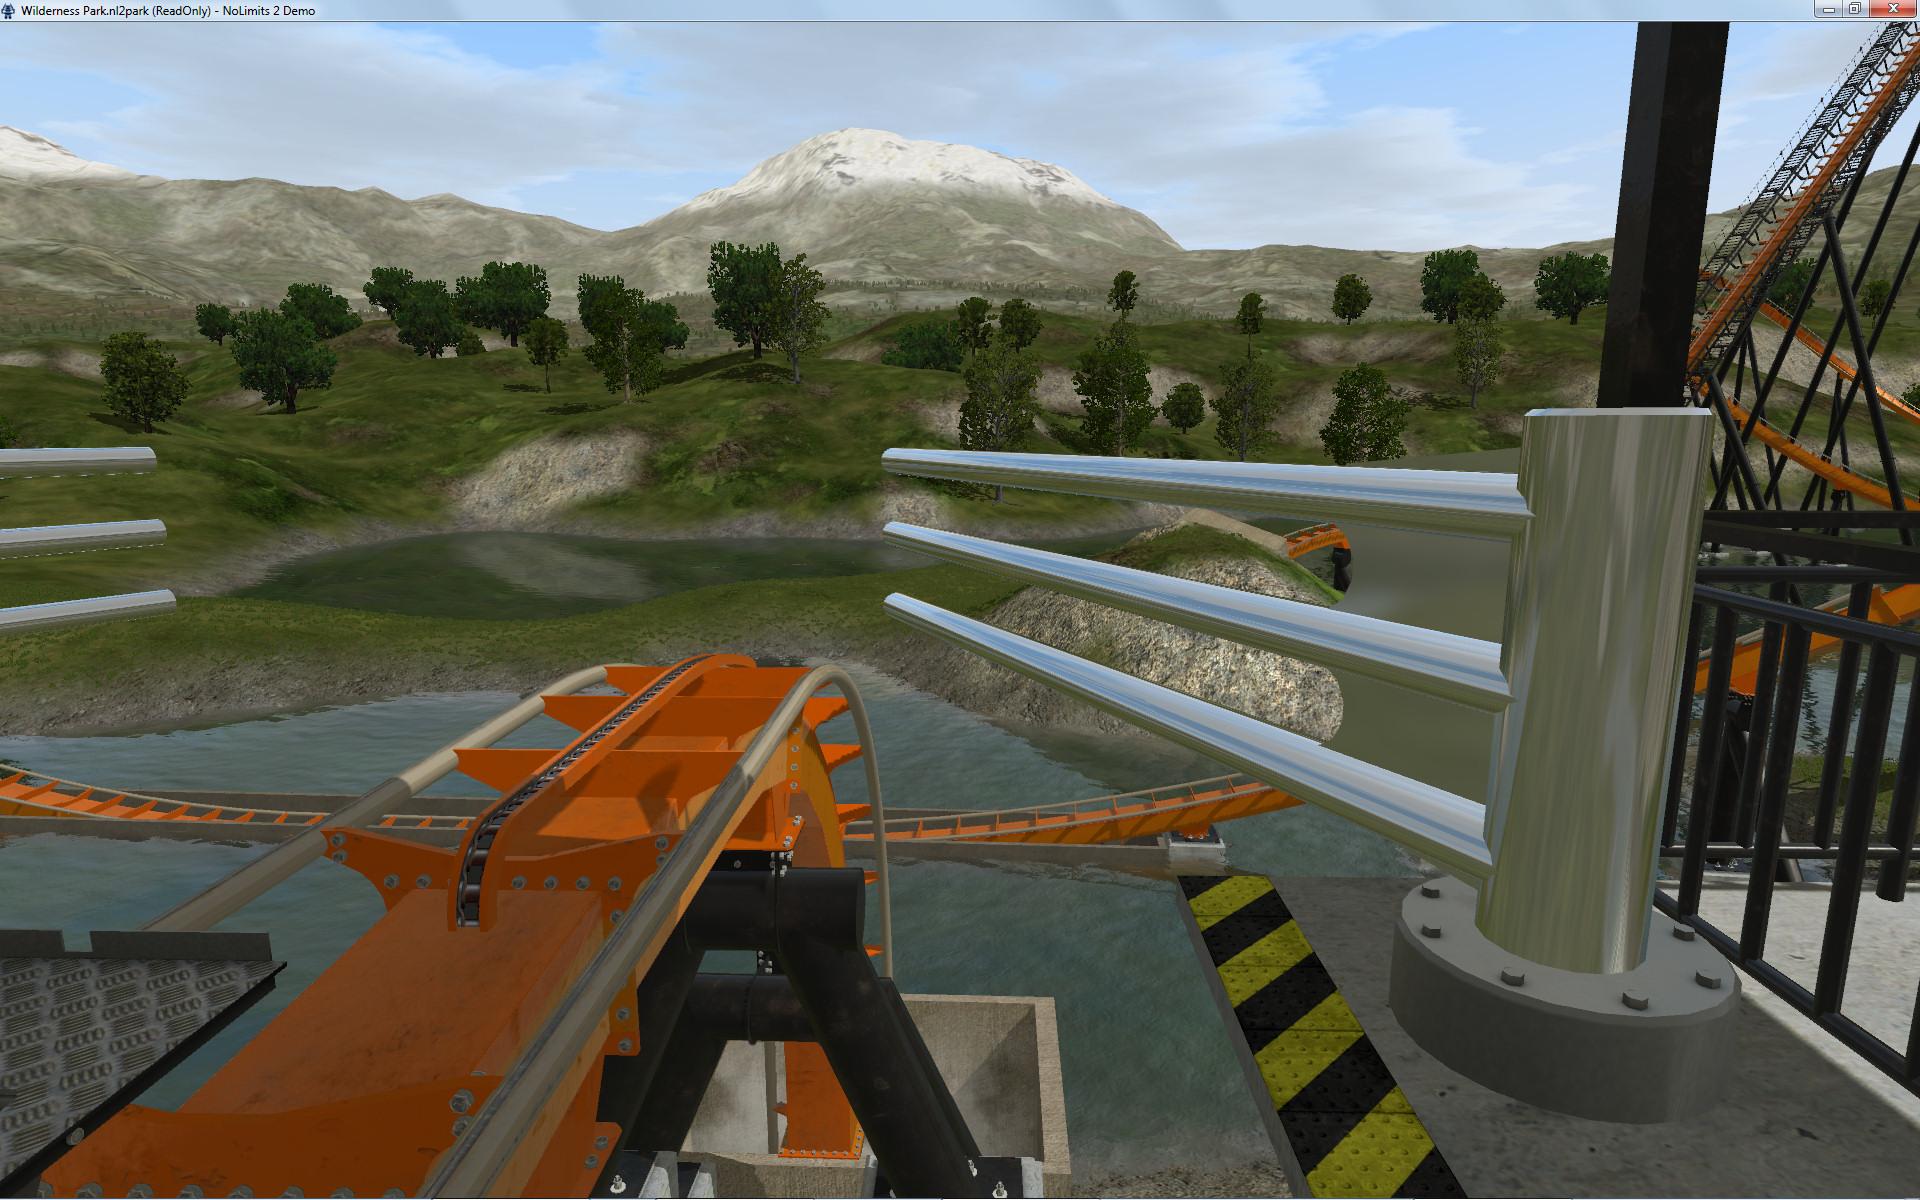 Nolimits 2 roller coaster simulation free download gamehackstudios.